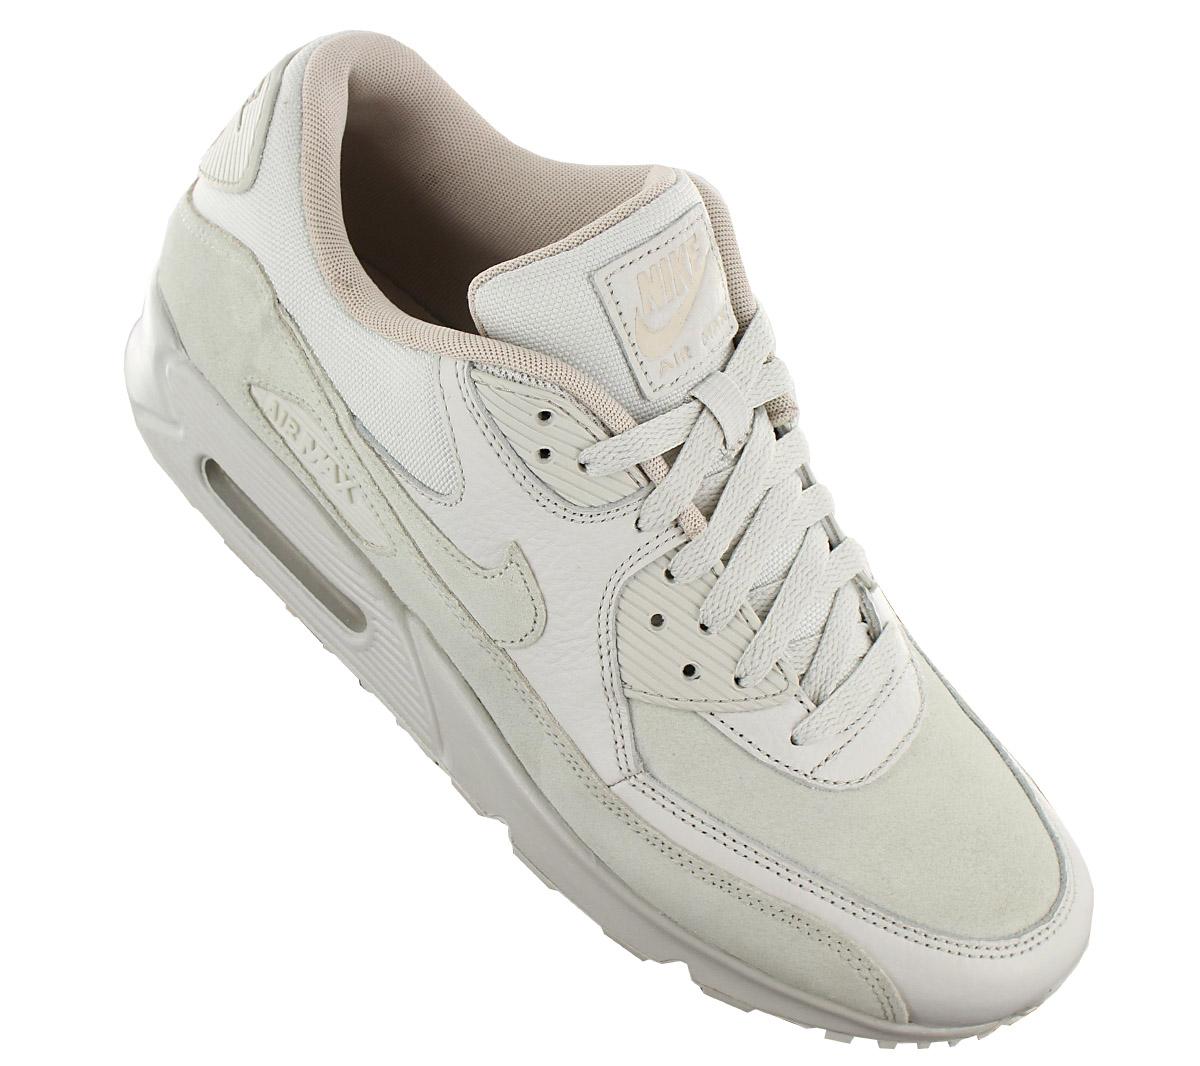 Details about Nike air max 90 Leather Premium Men's Sneaker Shoes Light Bone 700155 013